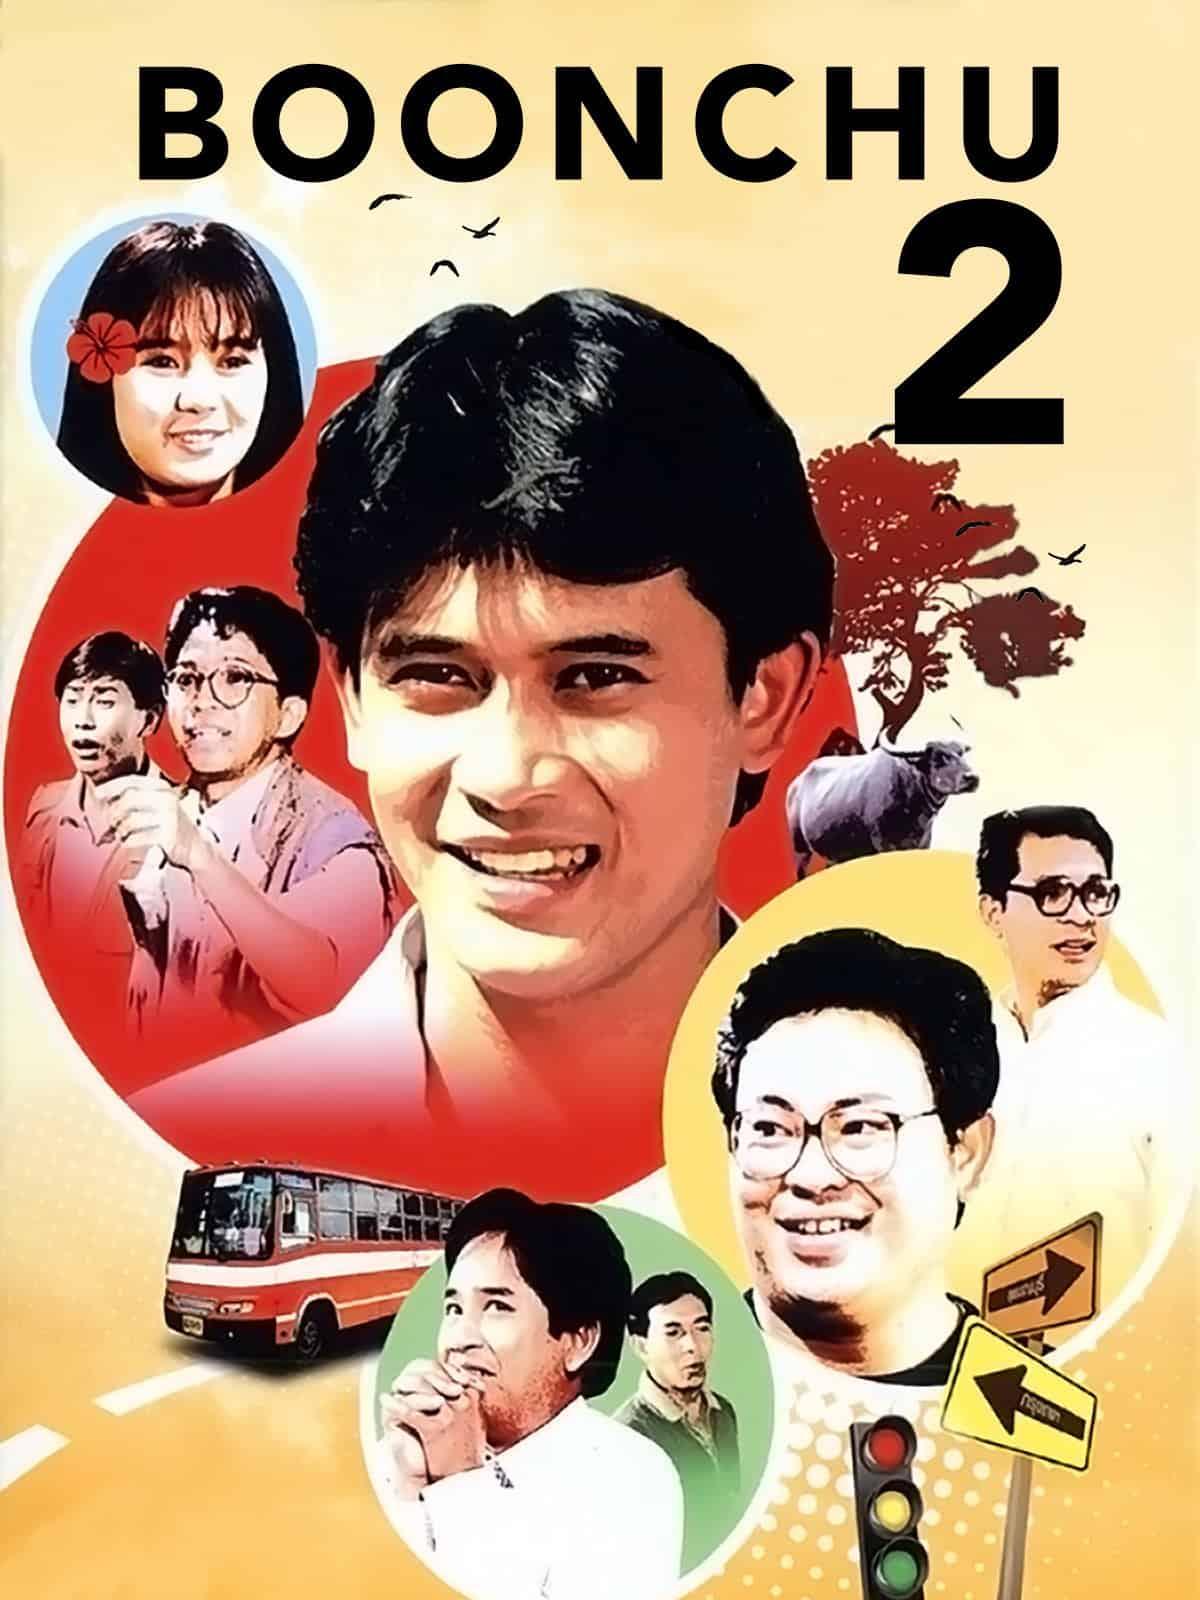 Boonchu 2 (1989) บุญชู 2 น้องใหม่